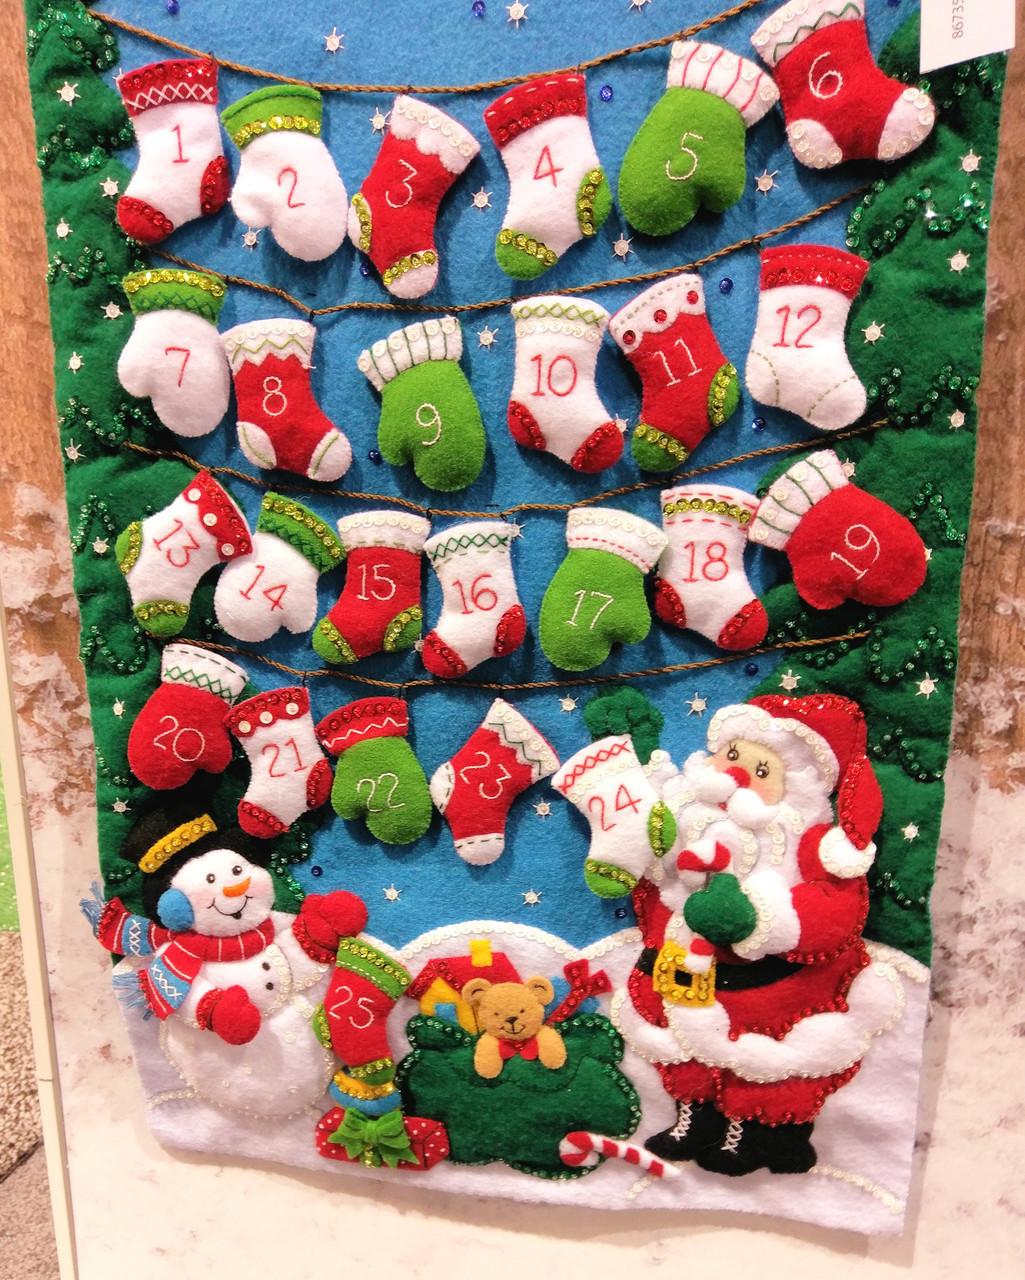 Plaid / Bucilla - Mittens and Stockings Advent Calendar